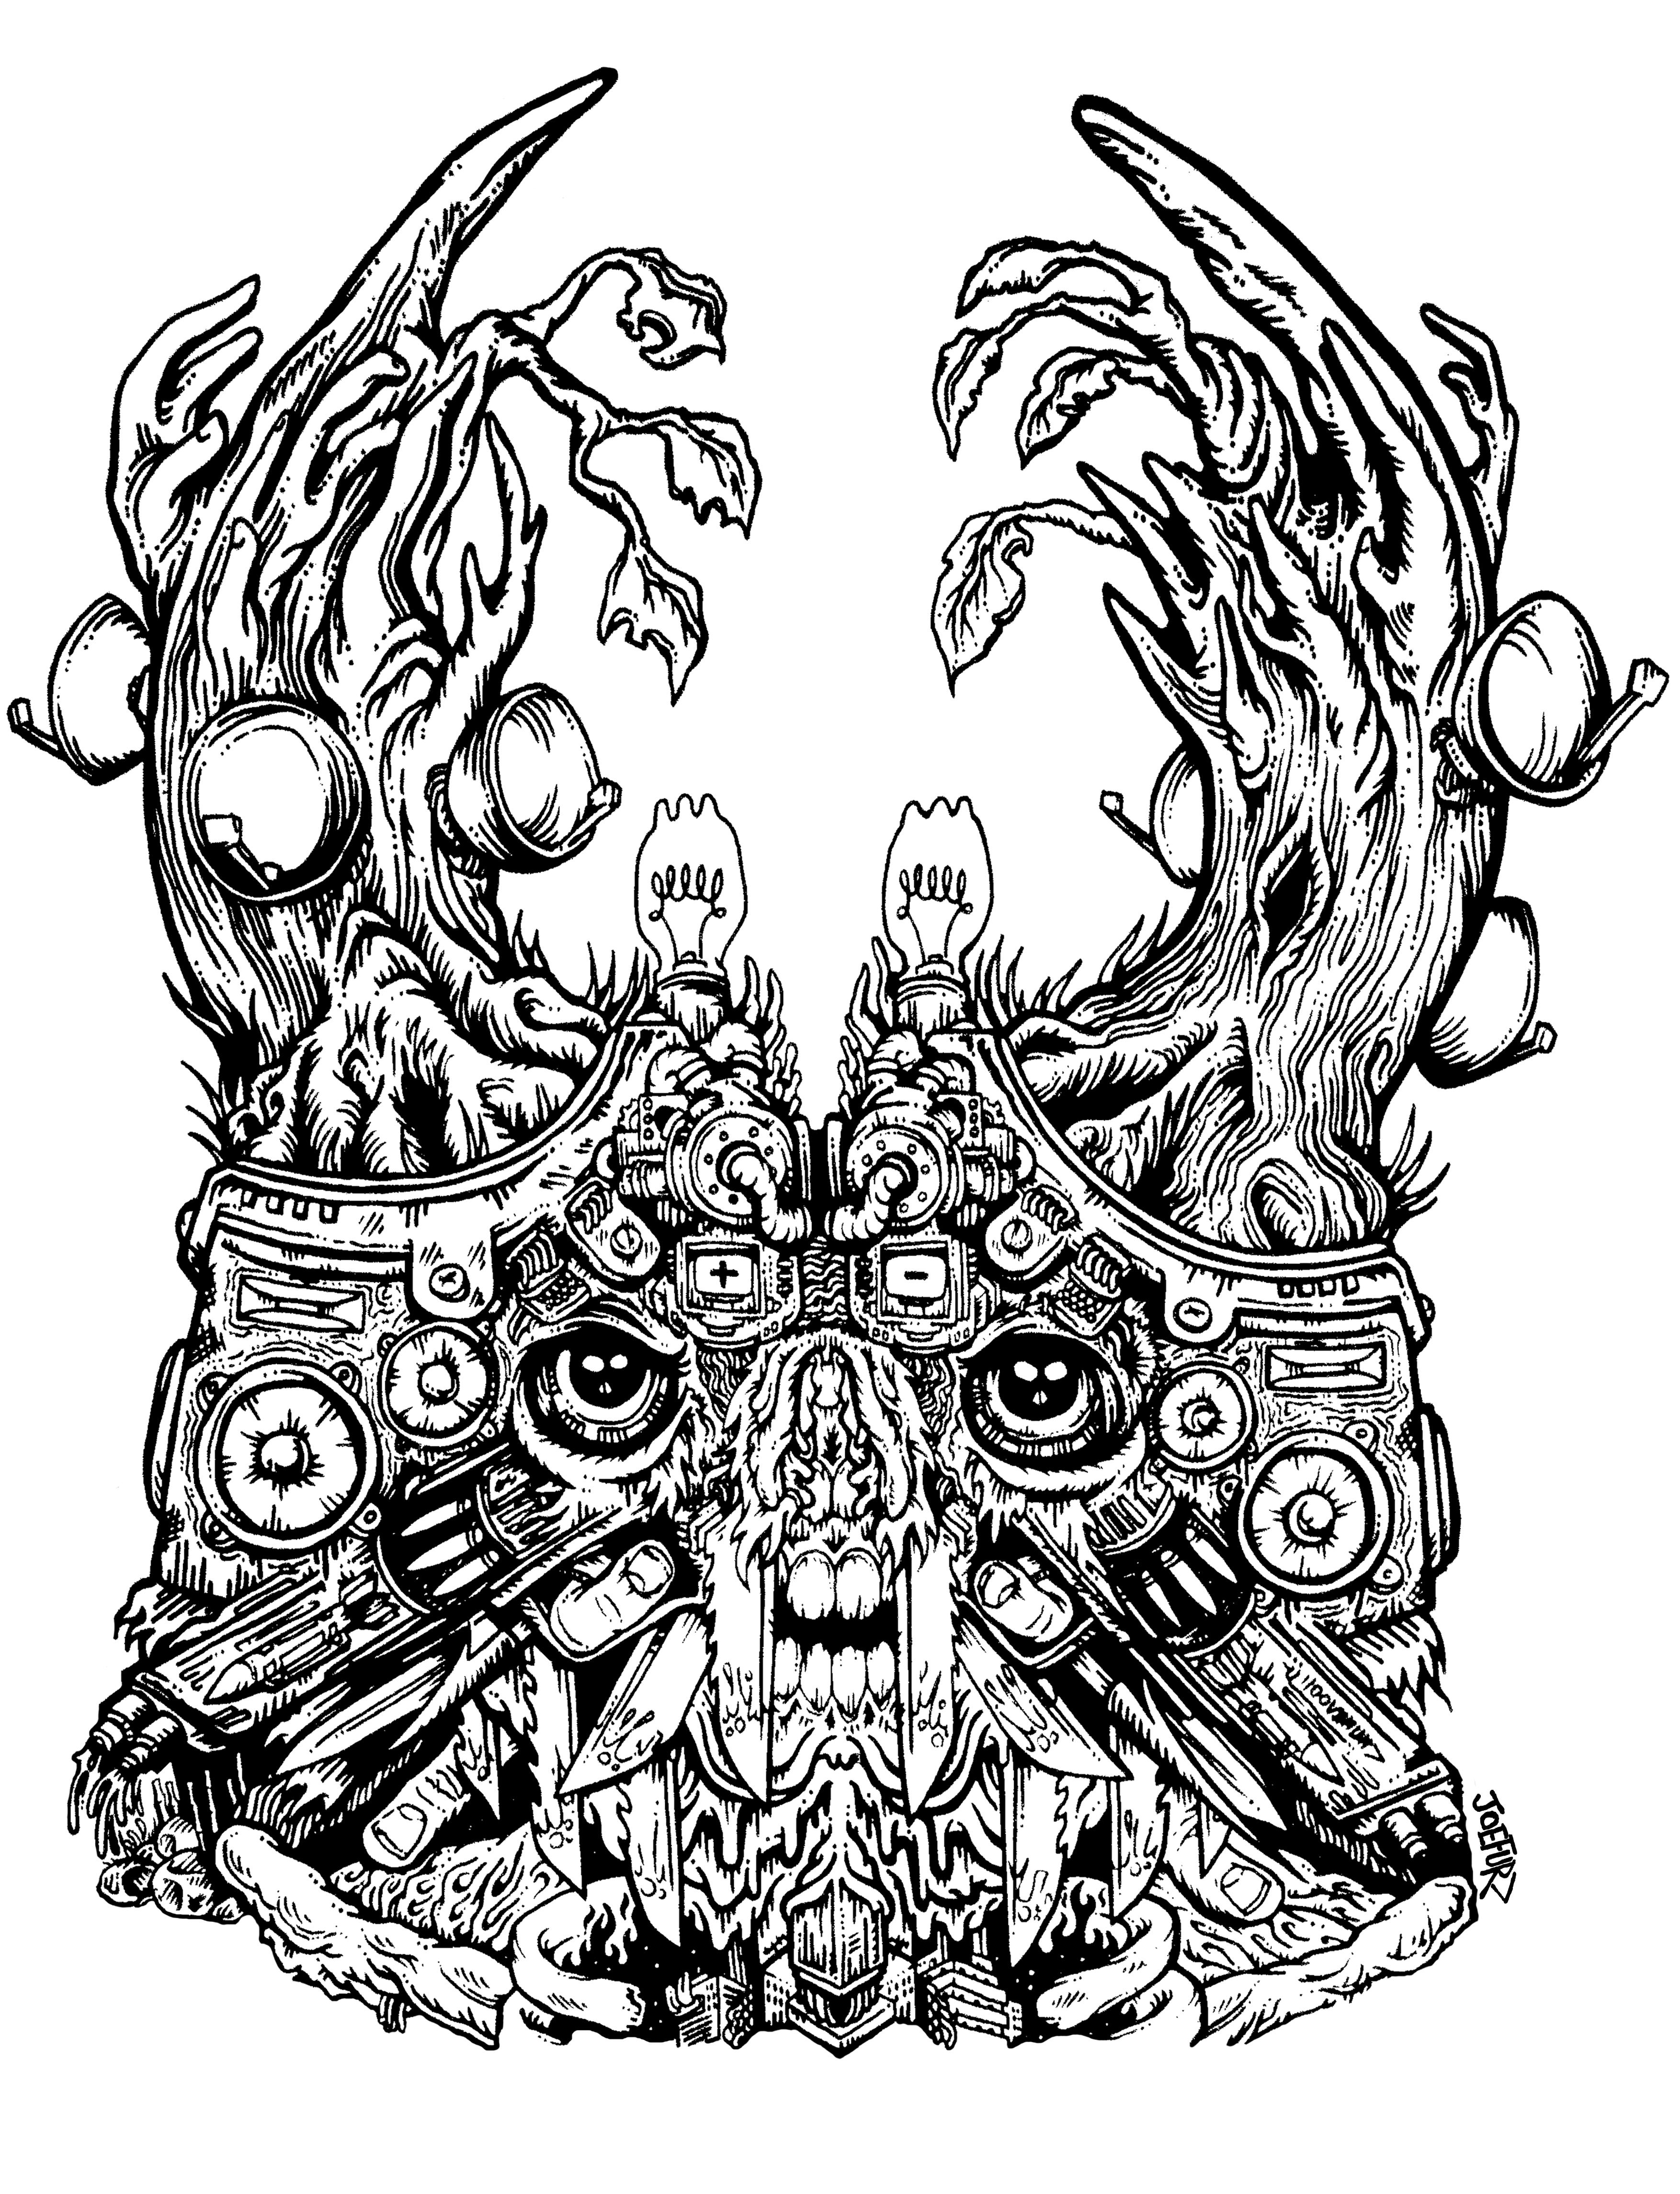 'Discordia (Head)' 2016